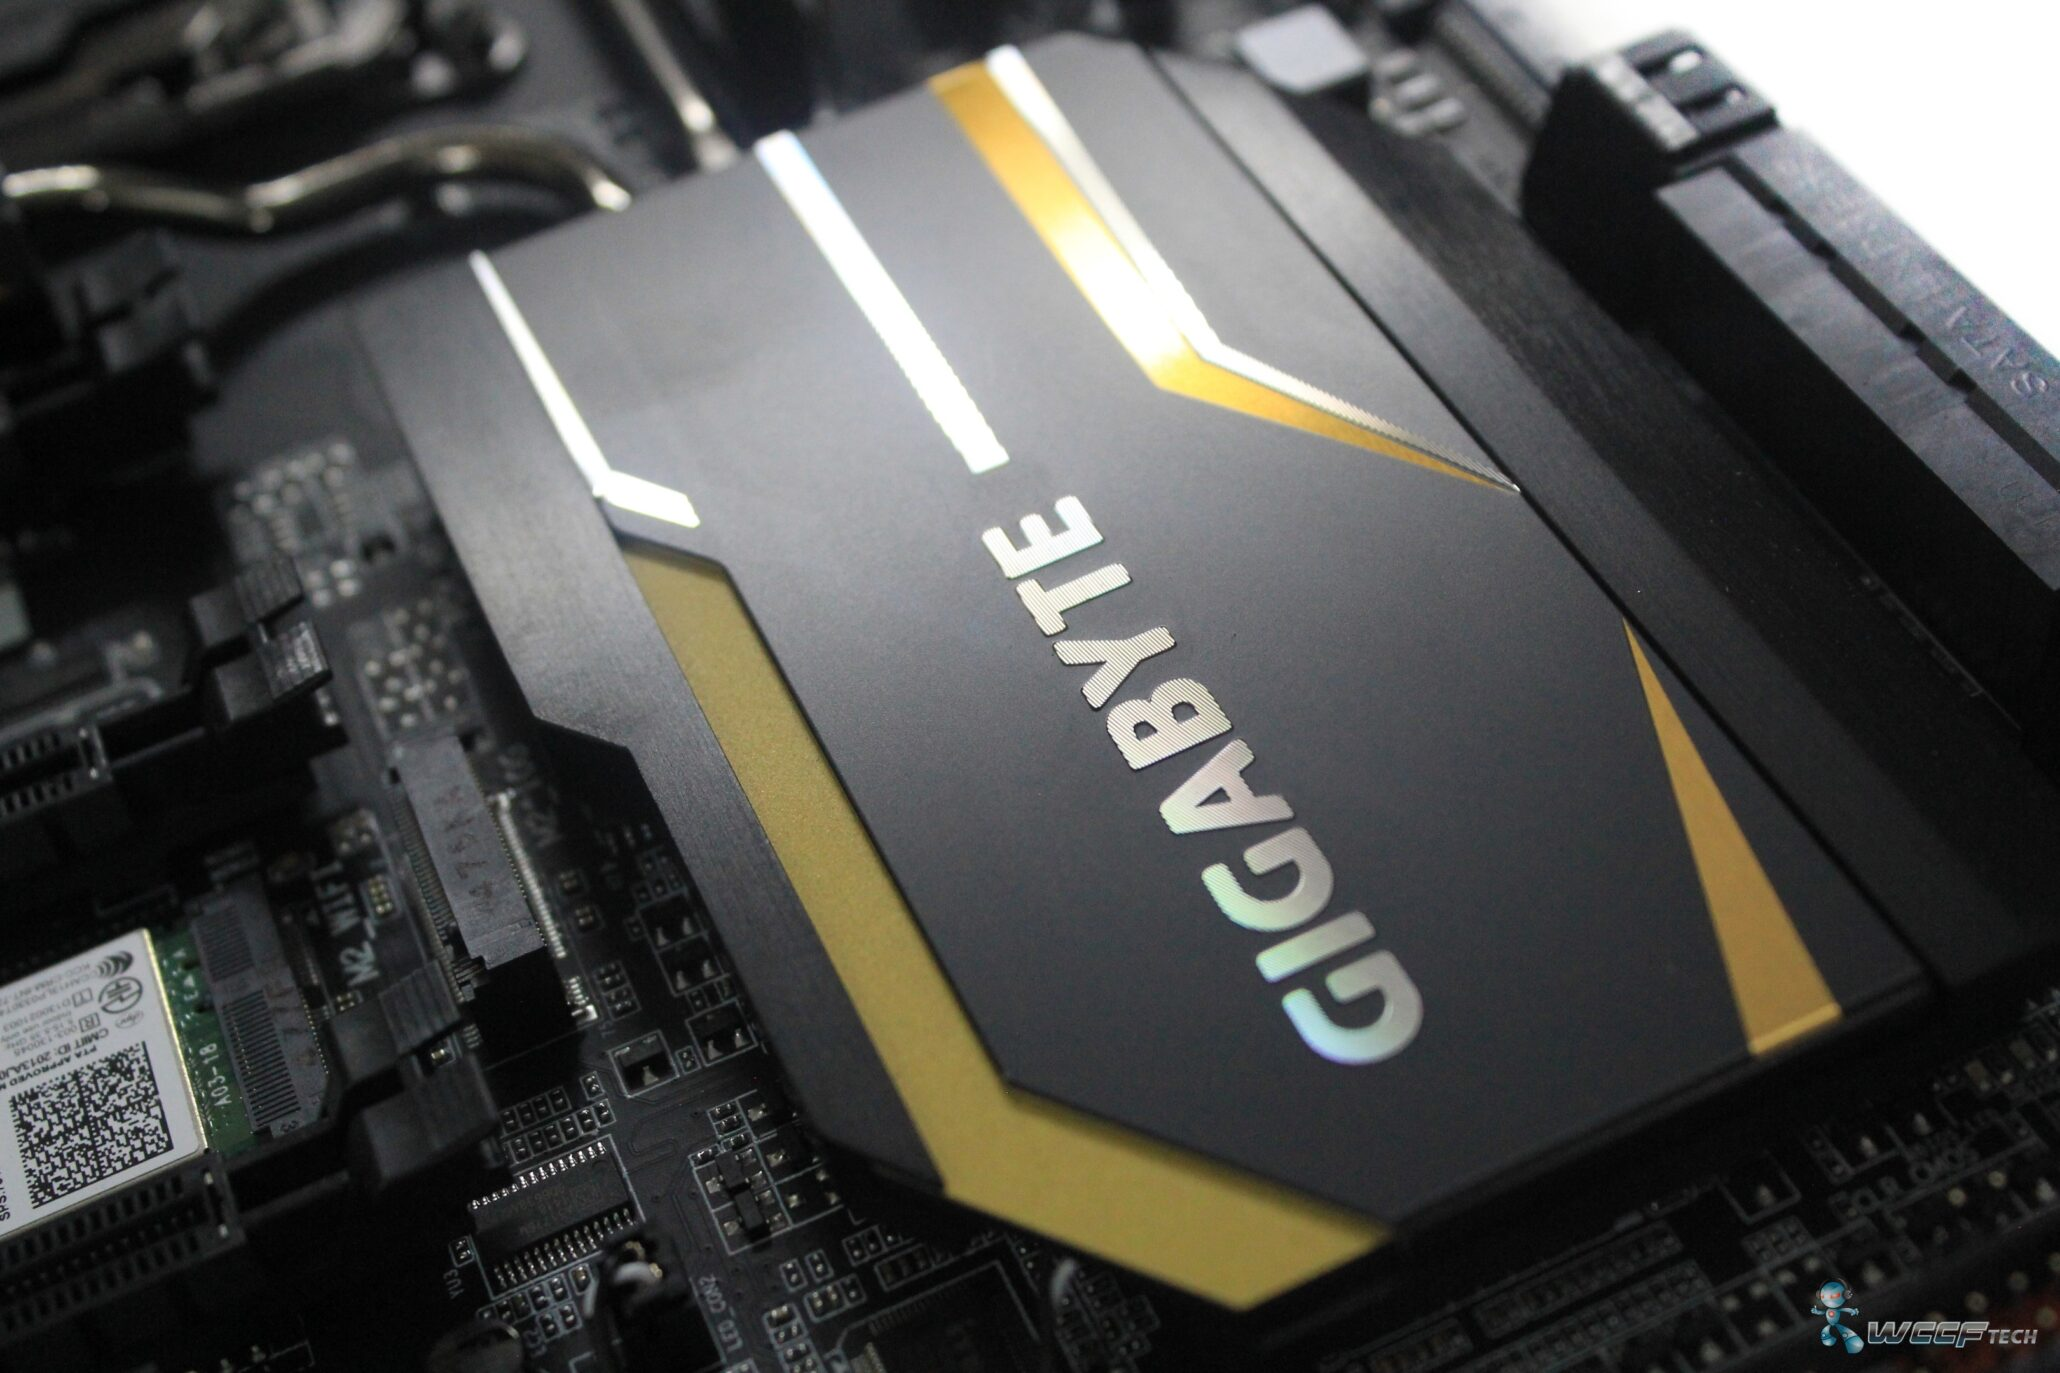 gigabyte-x99-ud7-wifi_pch-heatsink-4